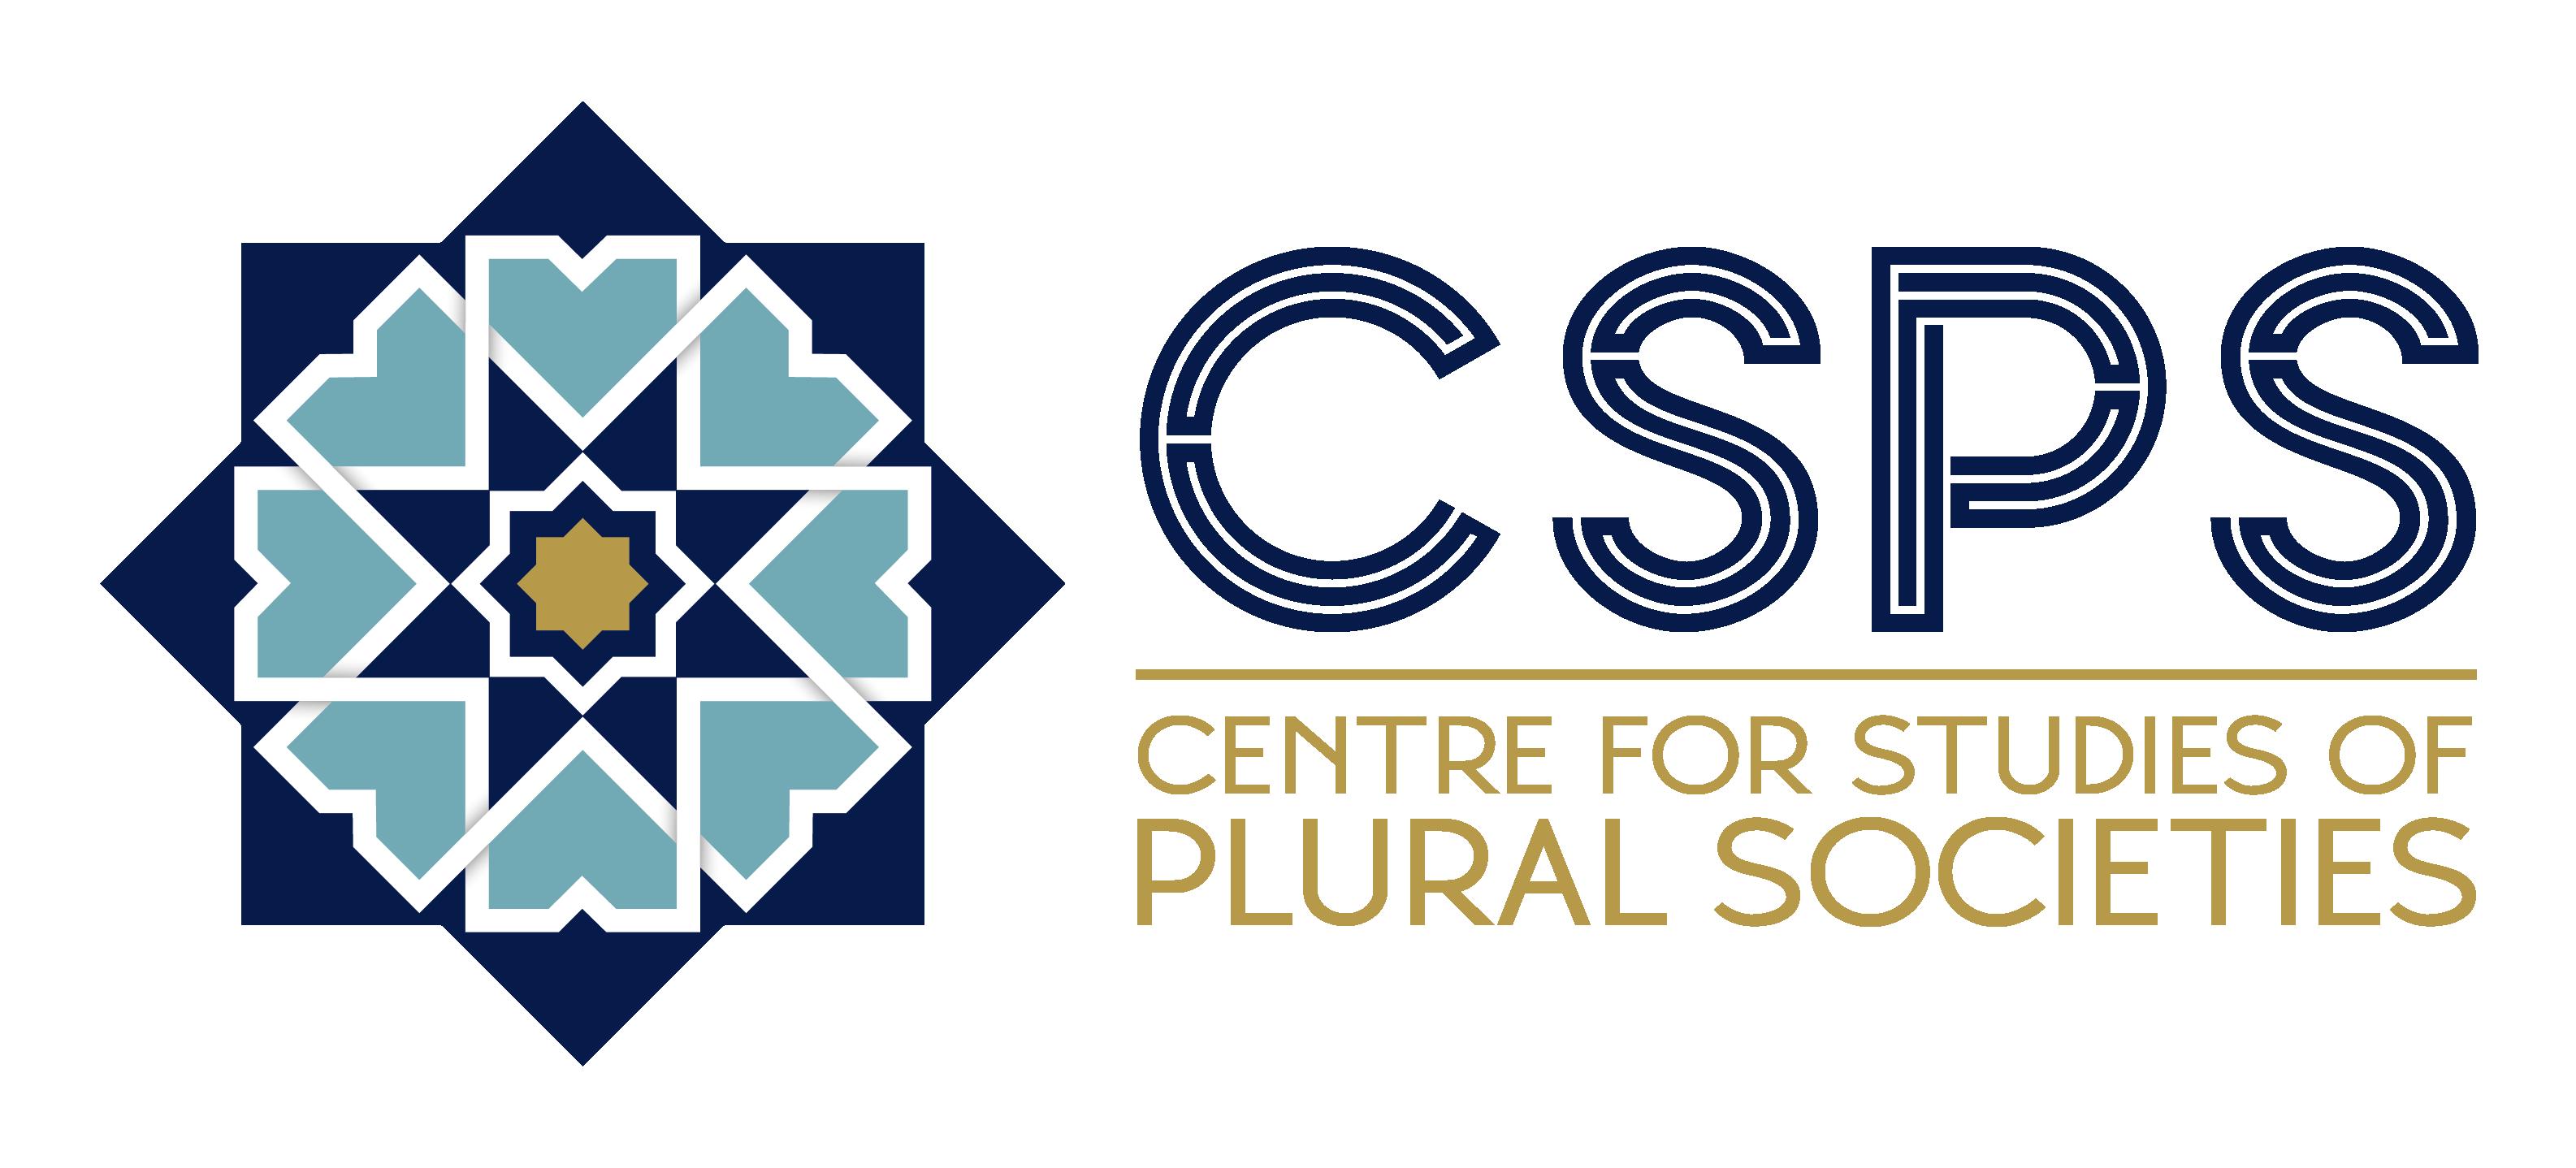 Centre for Studies of Plural Societies